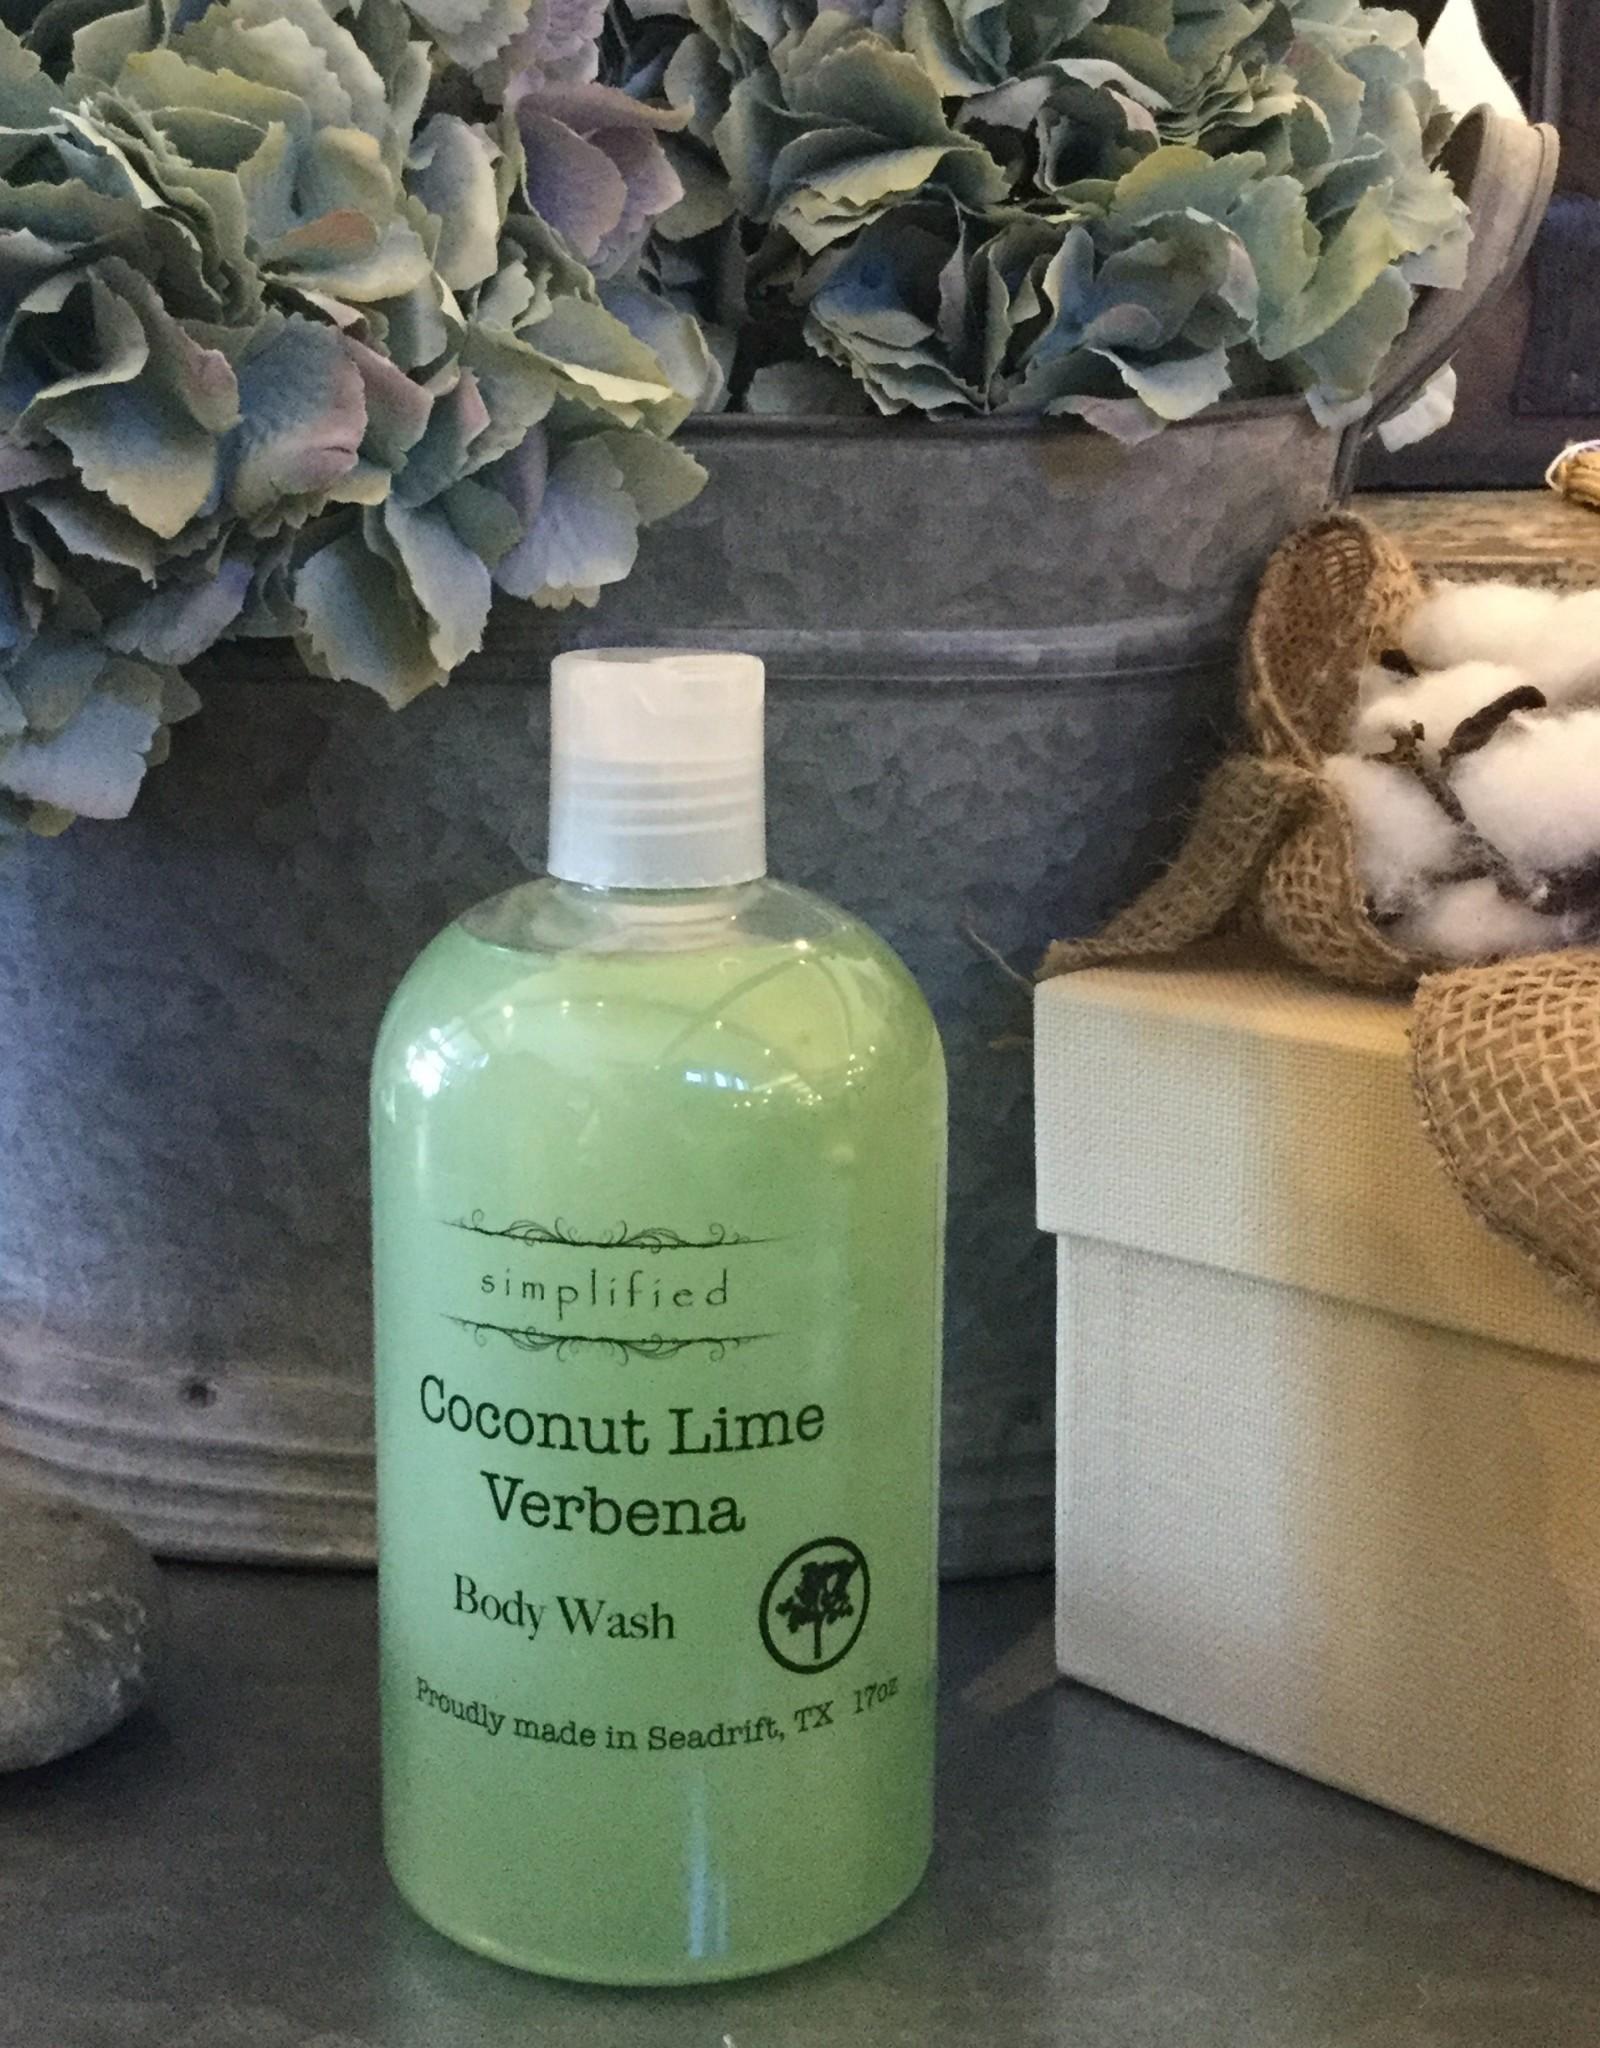 Simplified Soap Body Wash - Coconut Lime Verbena